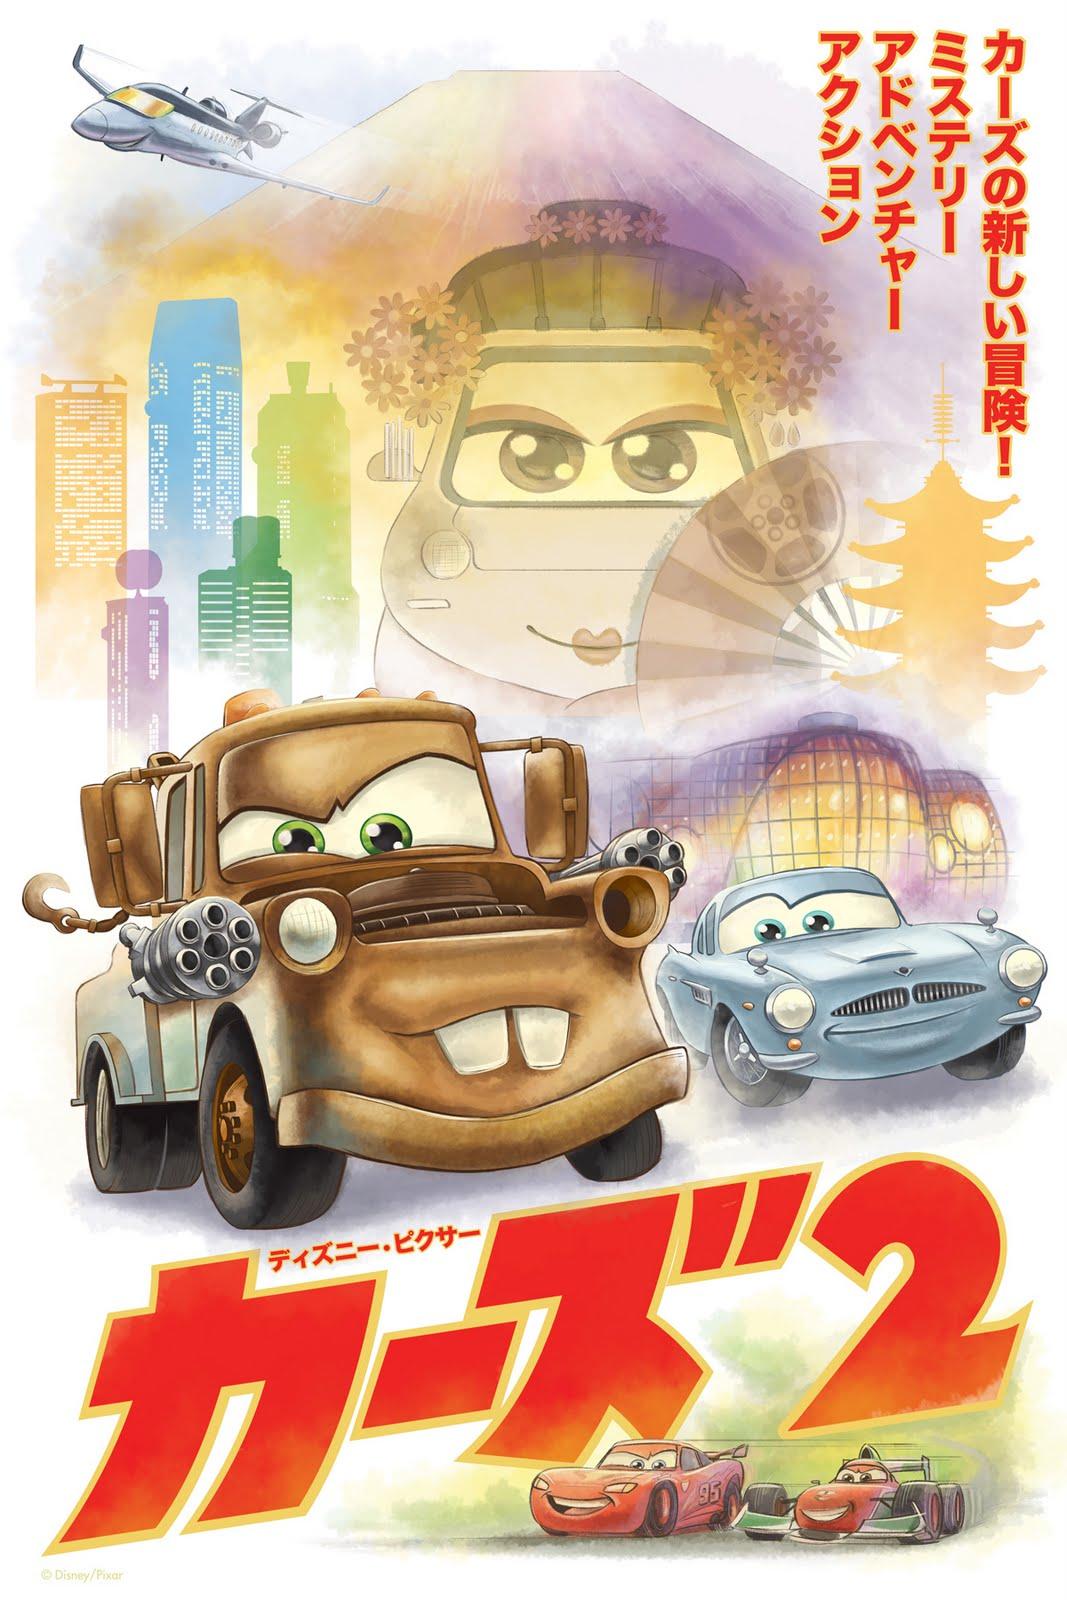 CARS 2 Posters - Disney Pixar Cars 2 Photo (24168089) - Fanpop